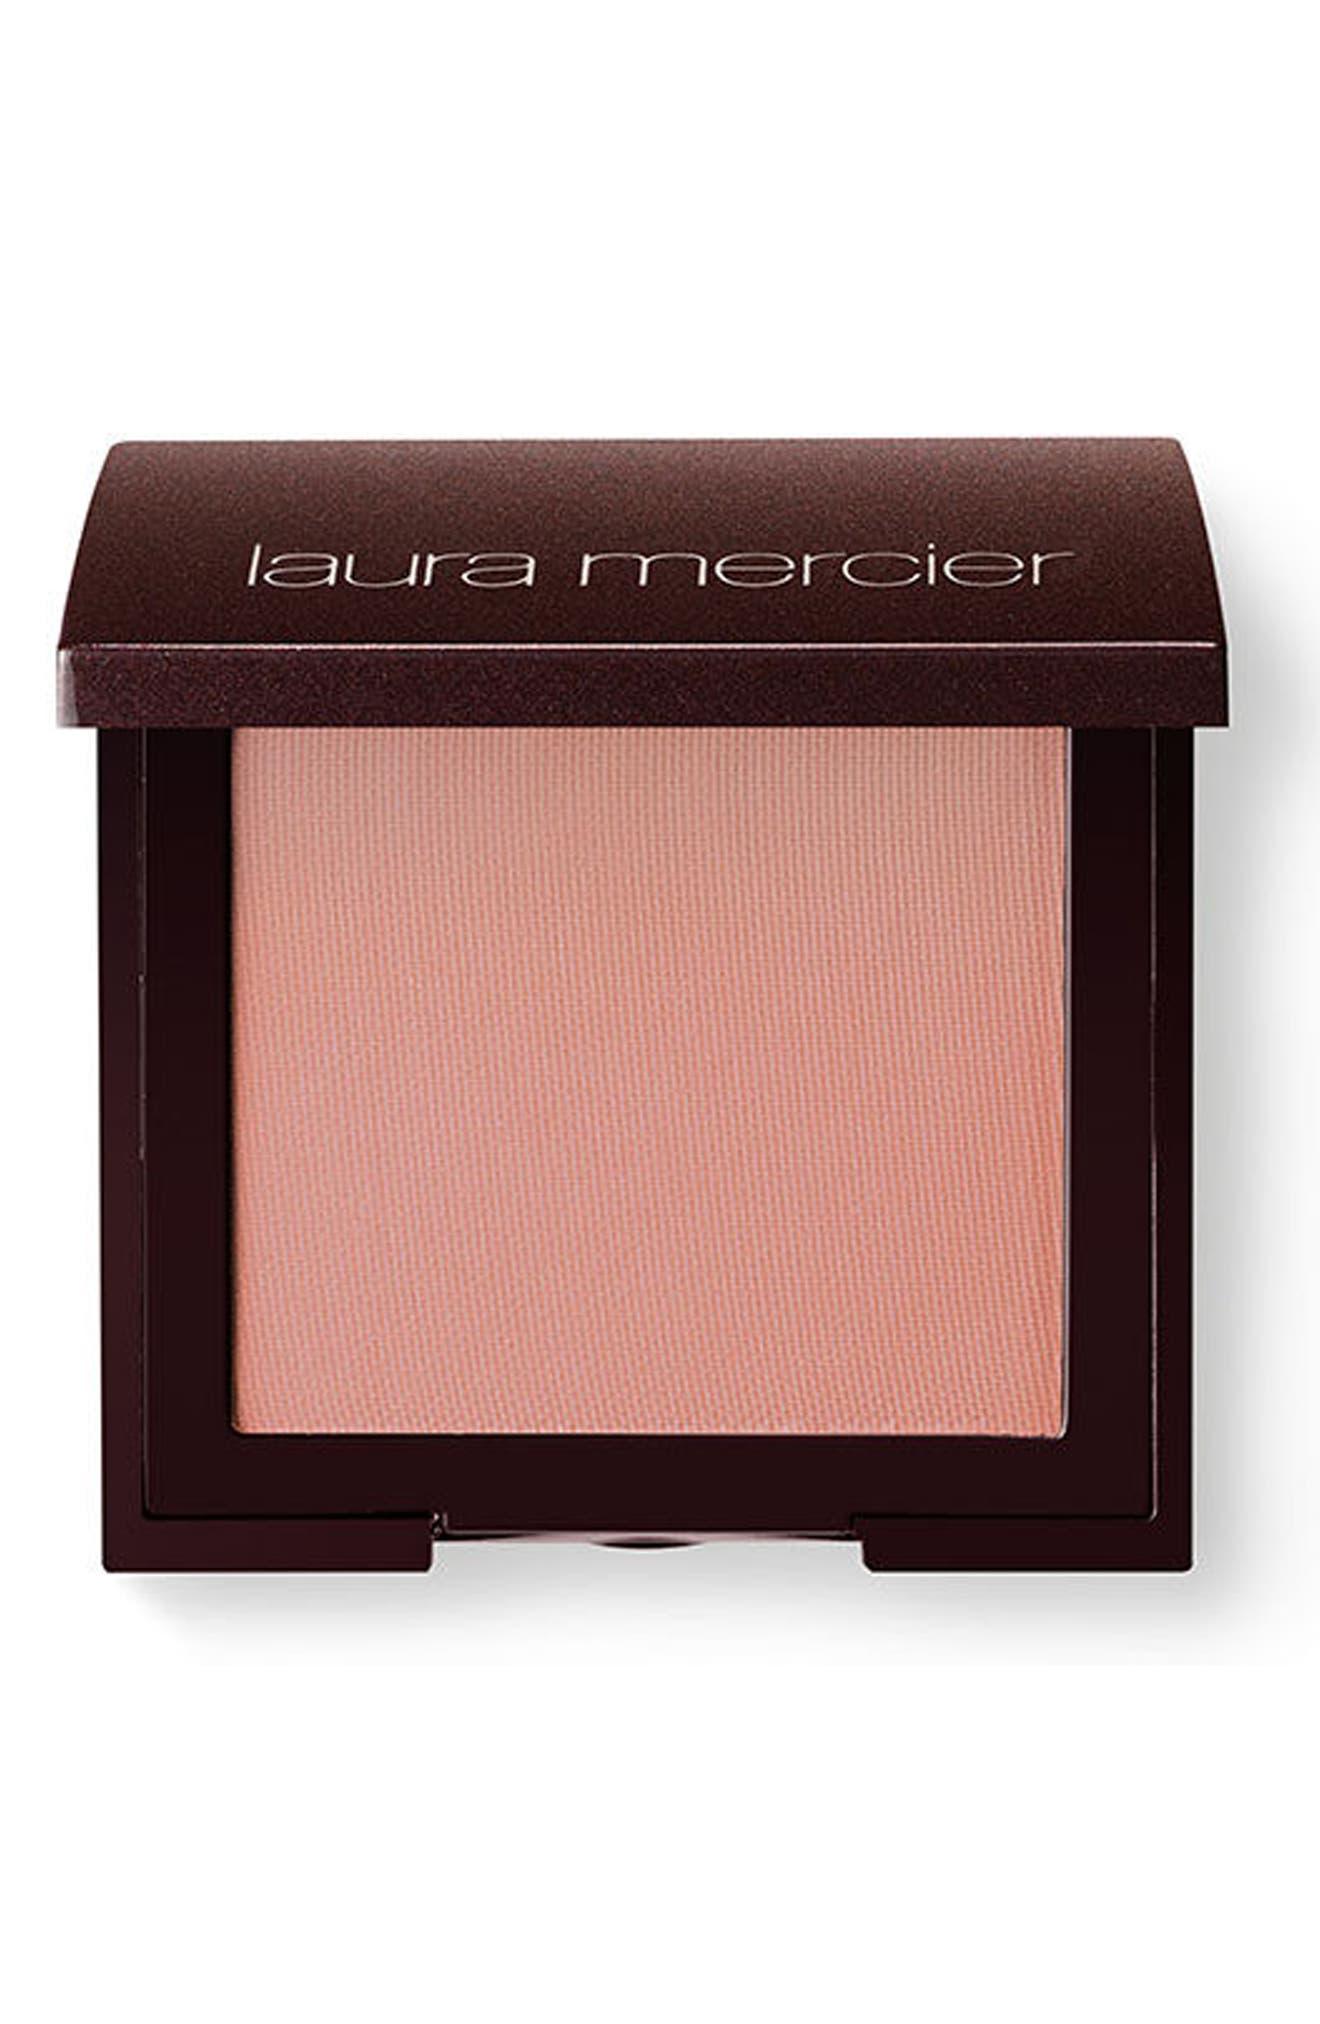 Alternate Image 1 Selected - Laura Mercier 'Second Skin' Cheek Color